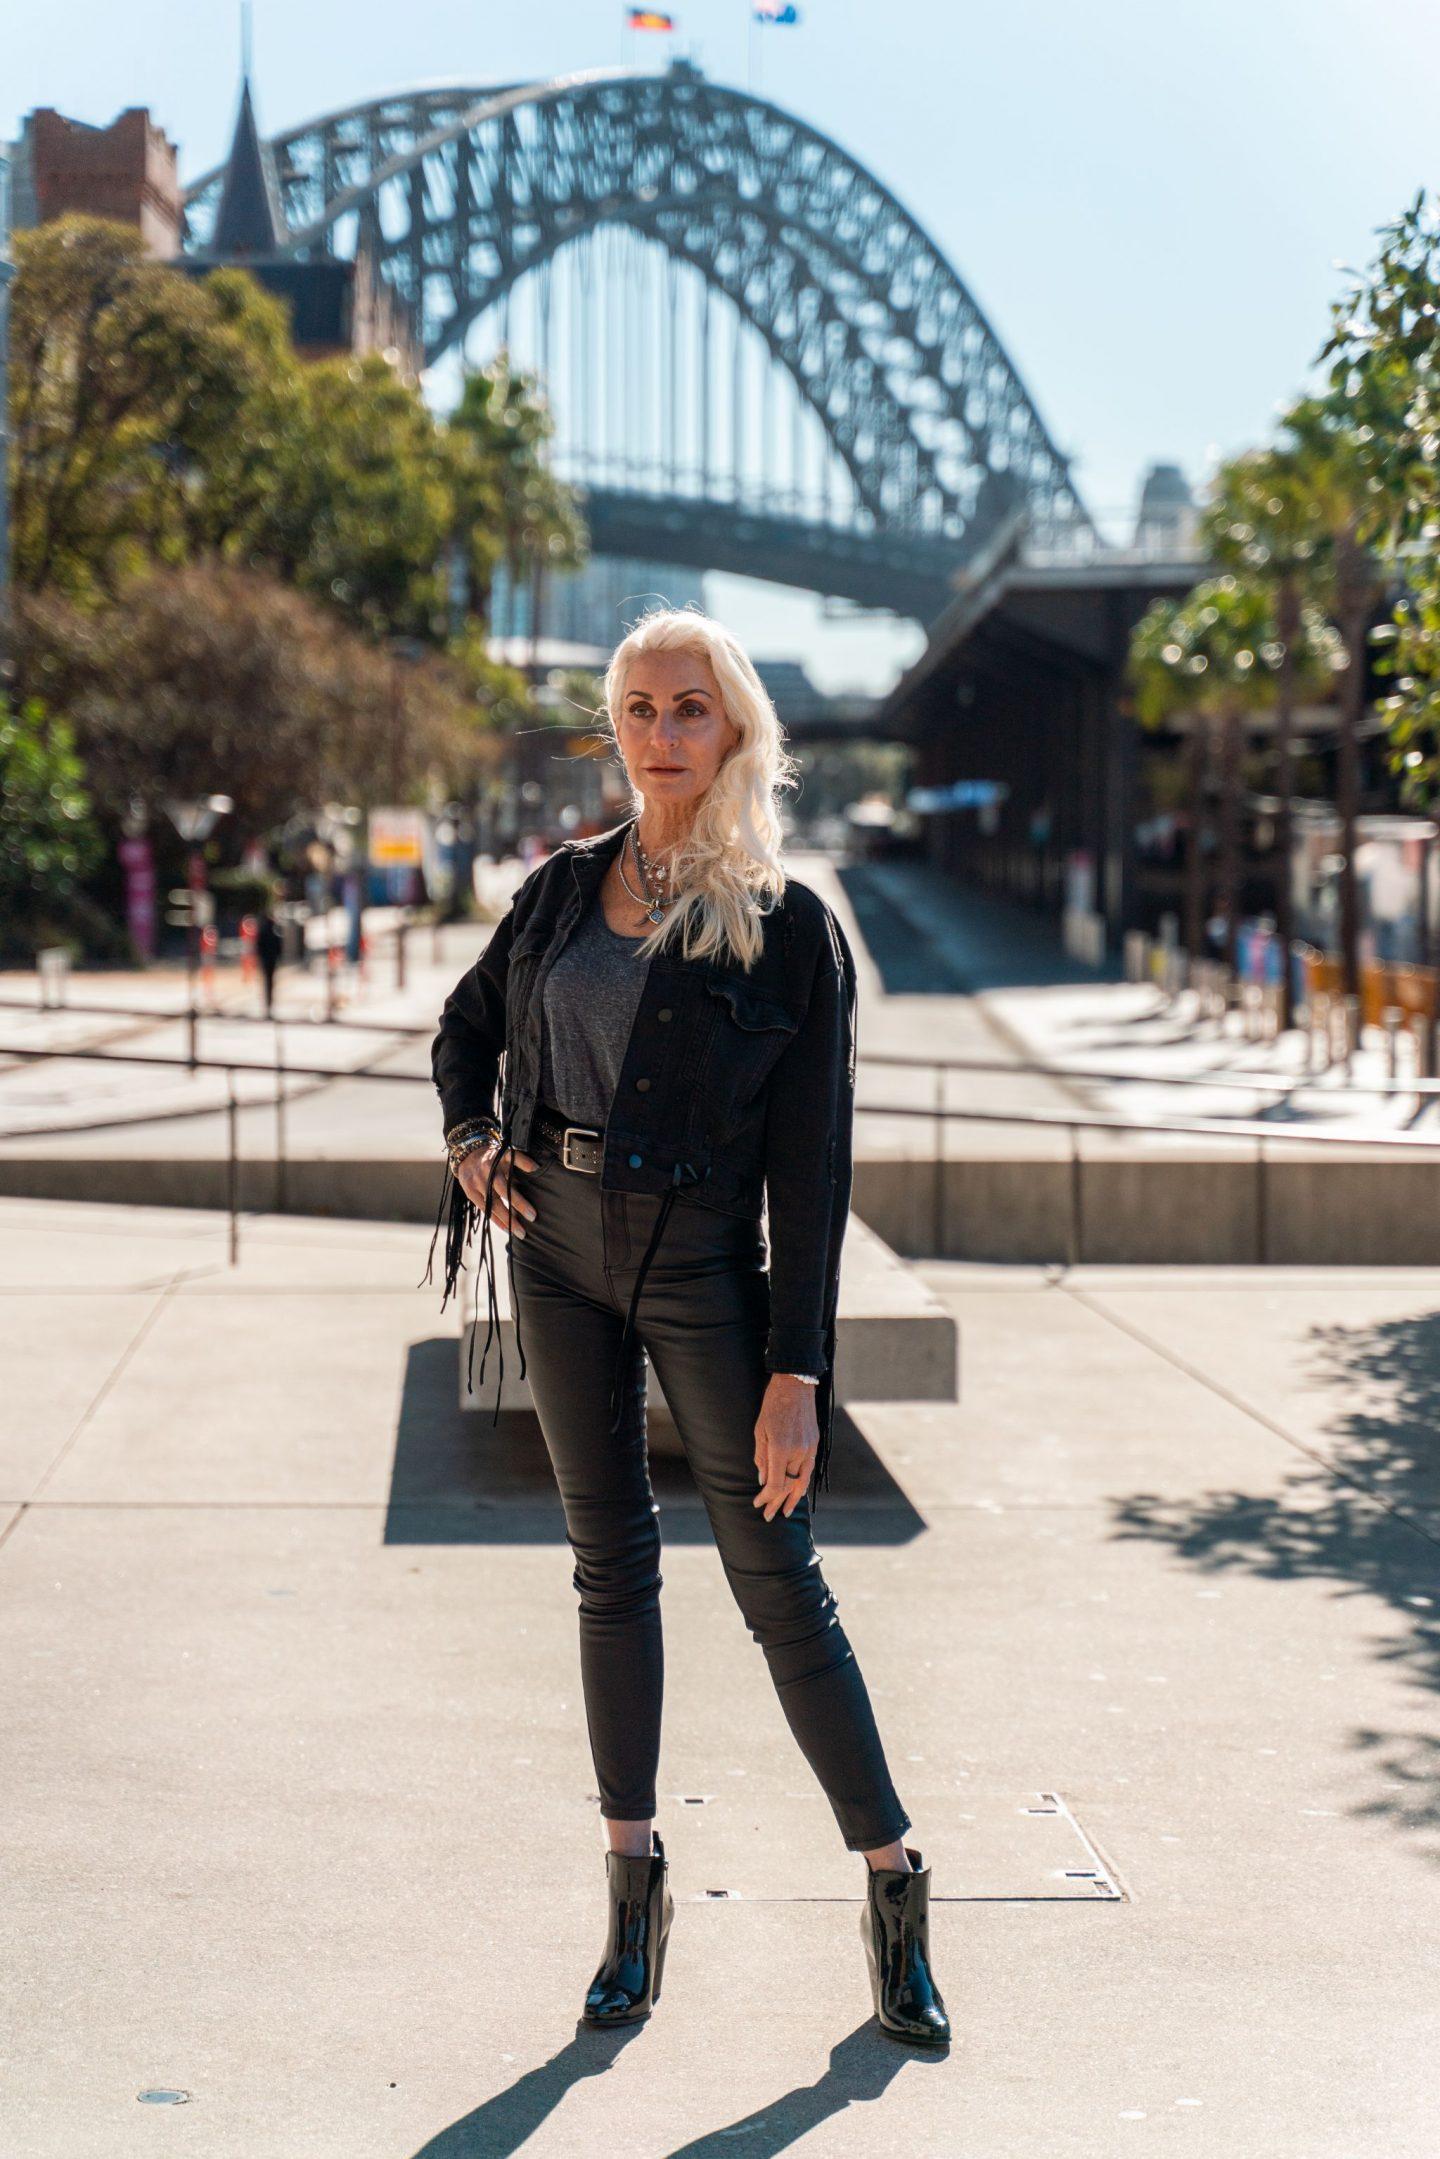 debbie corley fashion photoshoot - adventure in Australia